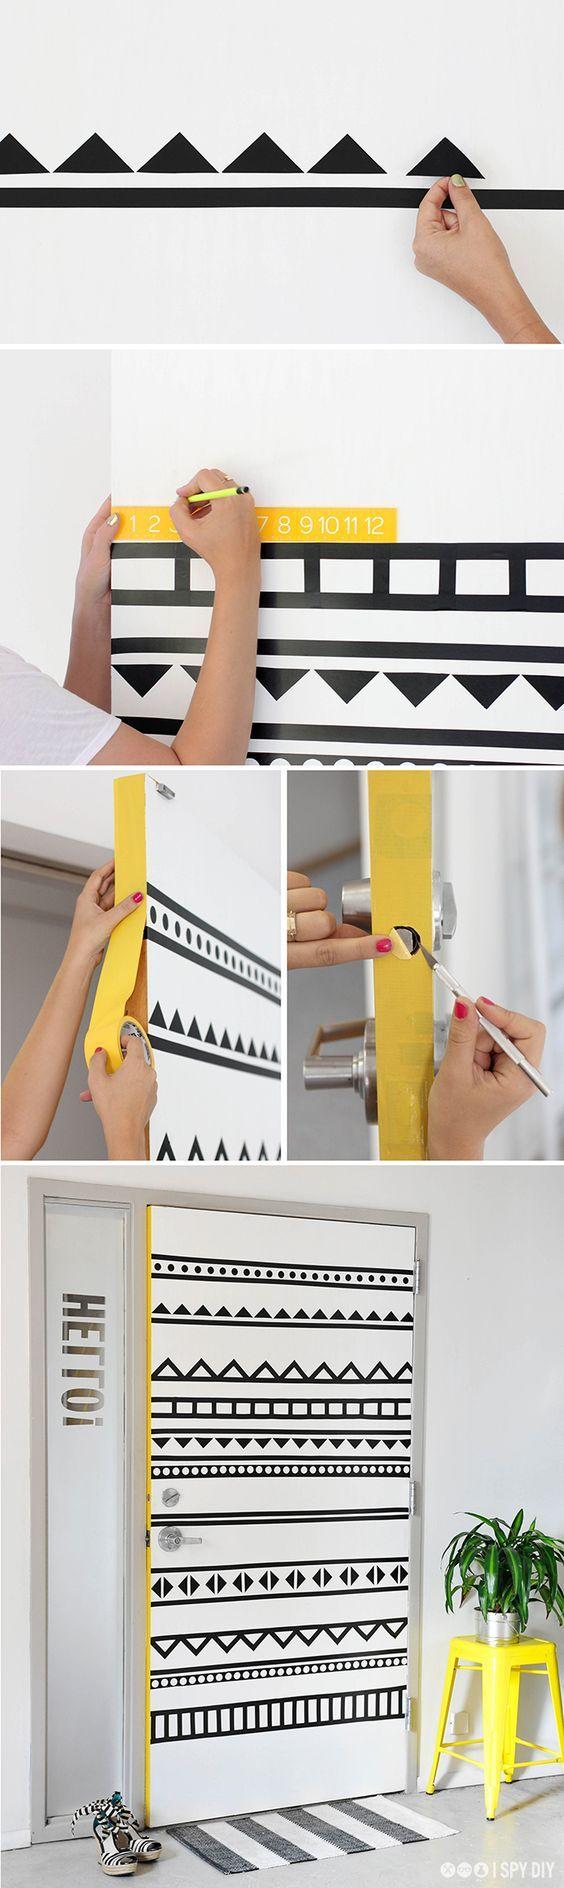 20 Creative Washi Tape Ideas   Duct tape, Washi tape and Washi